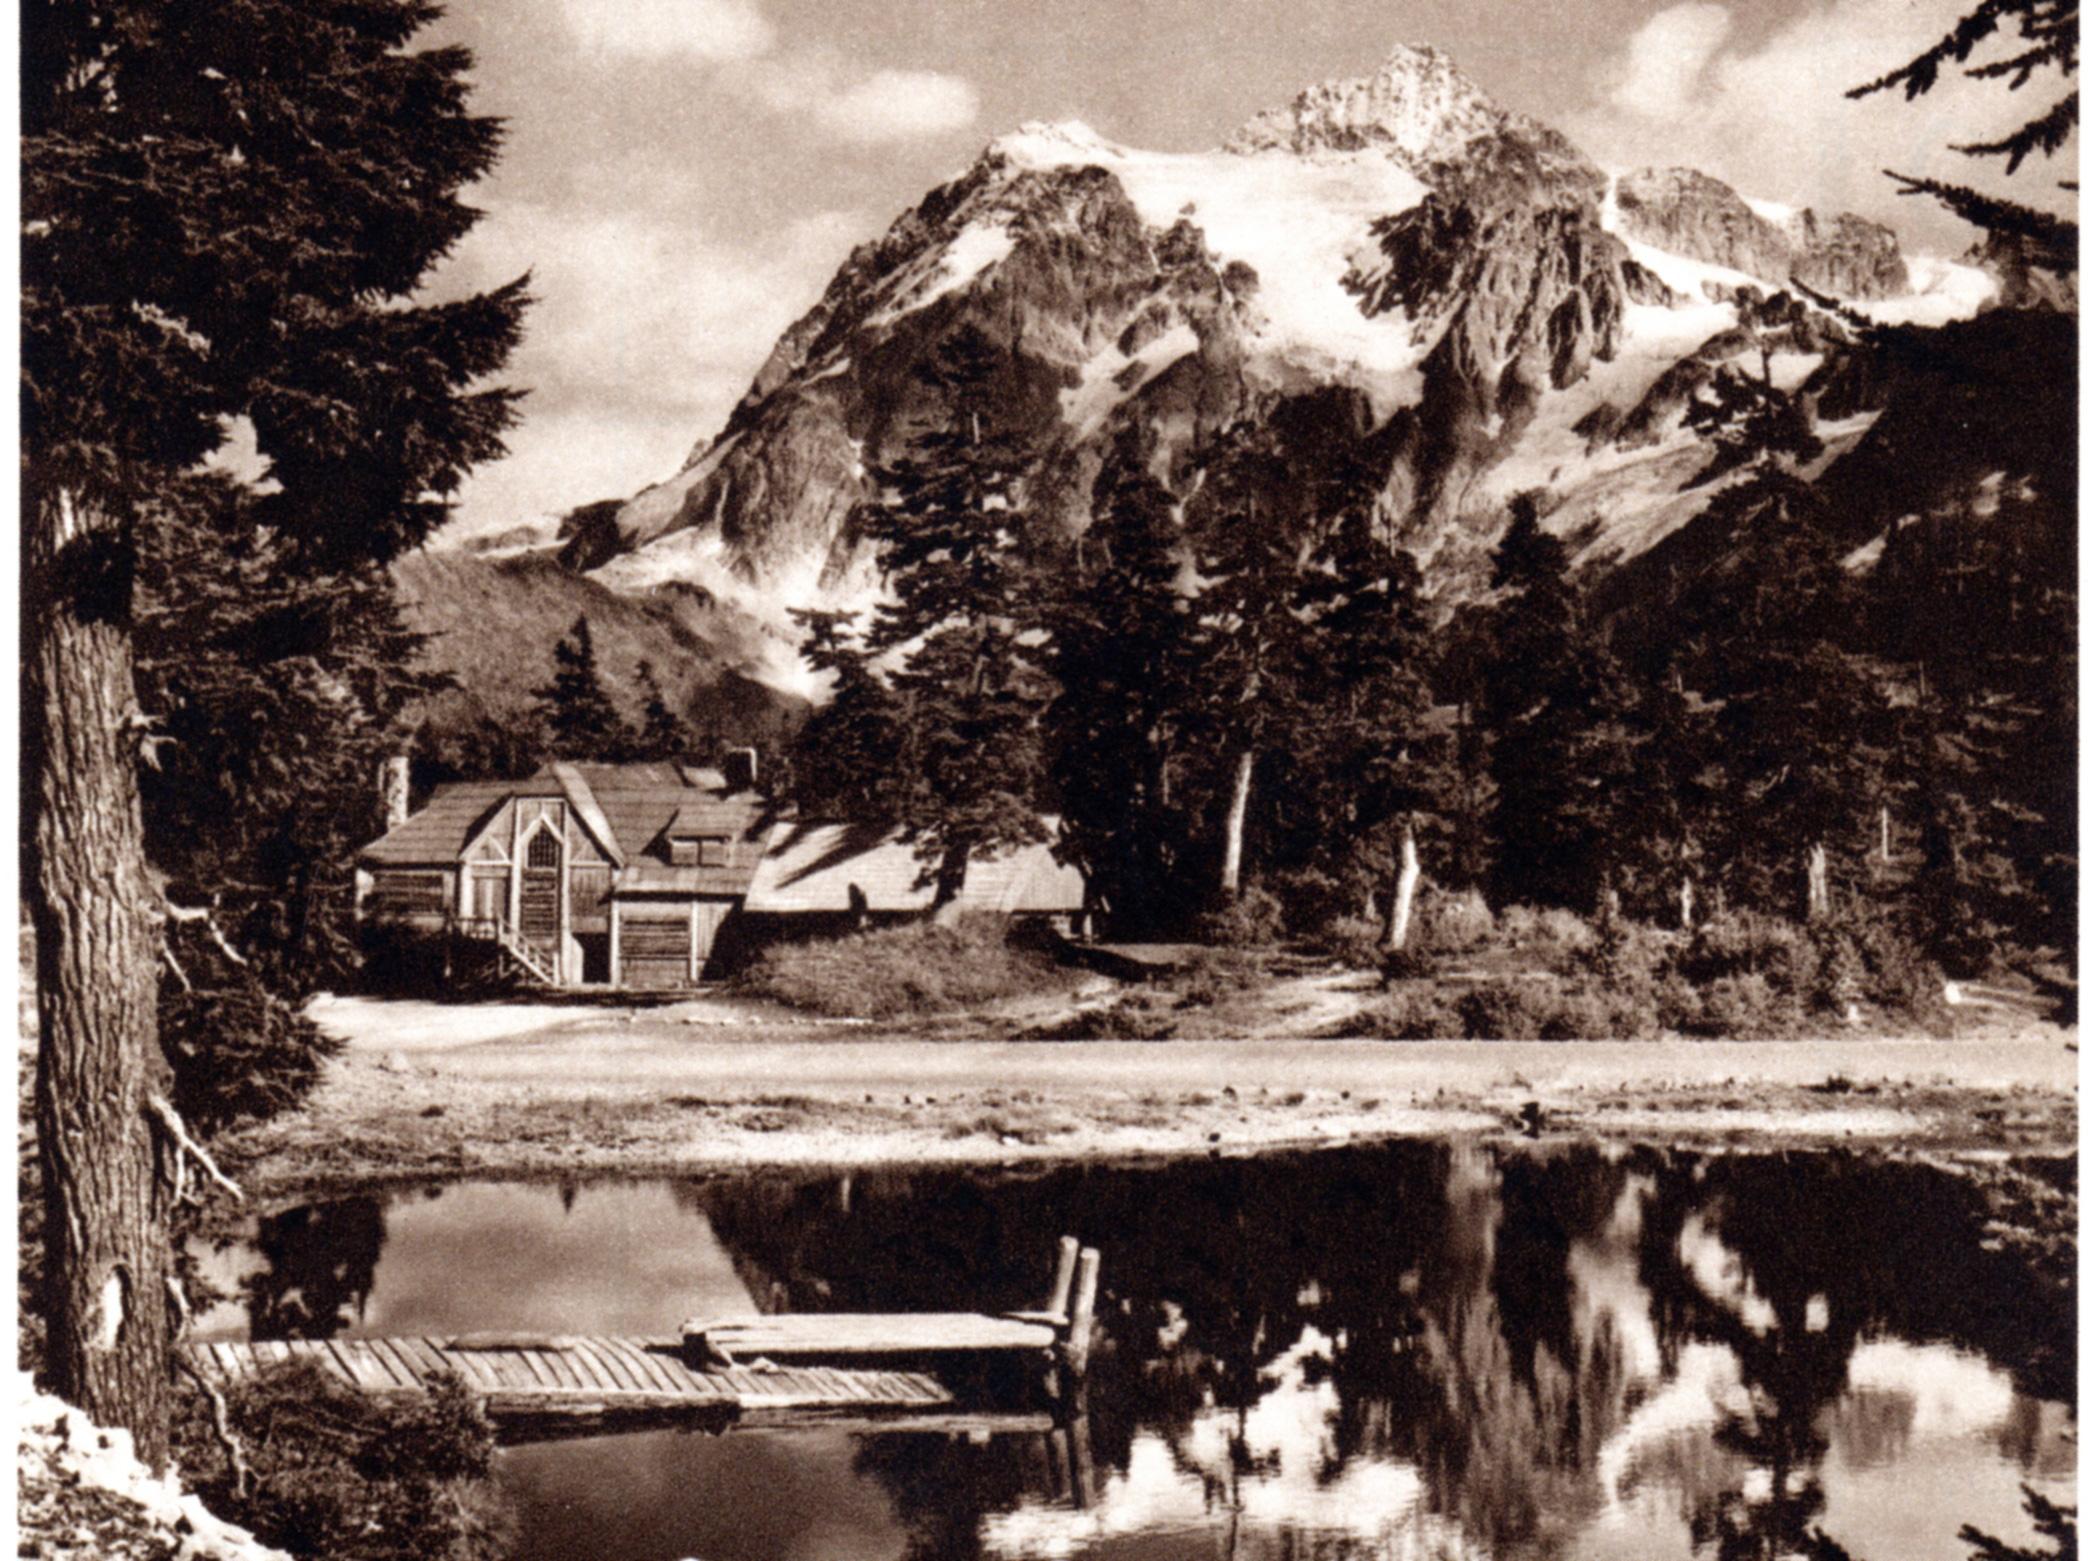 Northwest US vintage photos